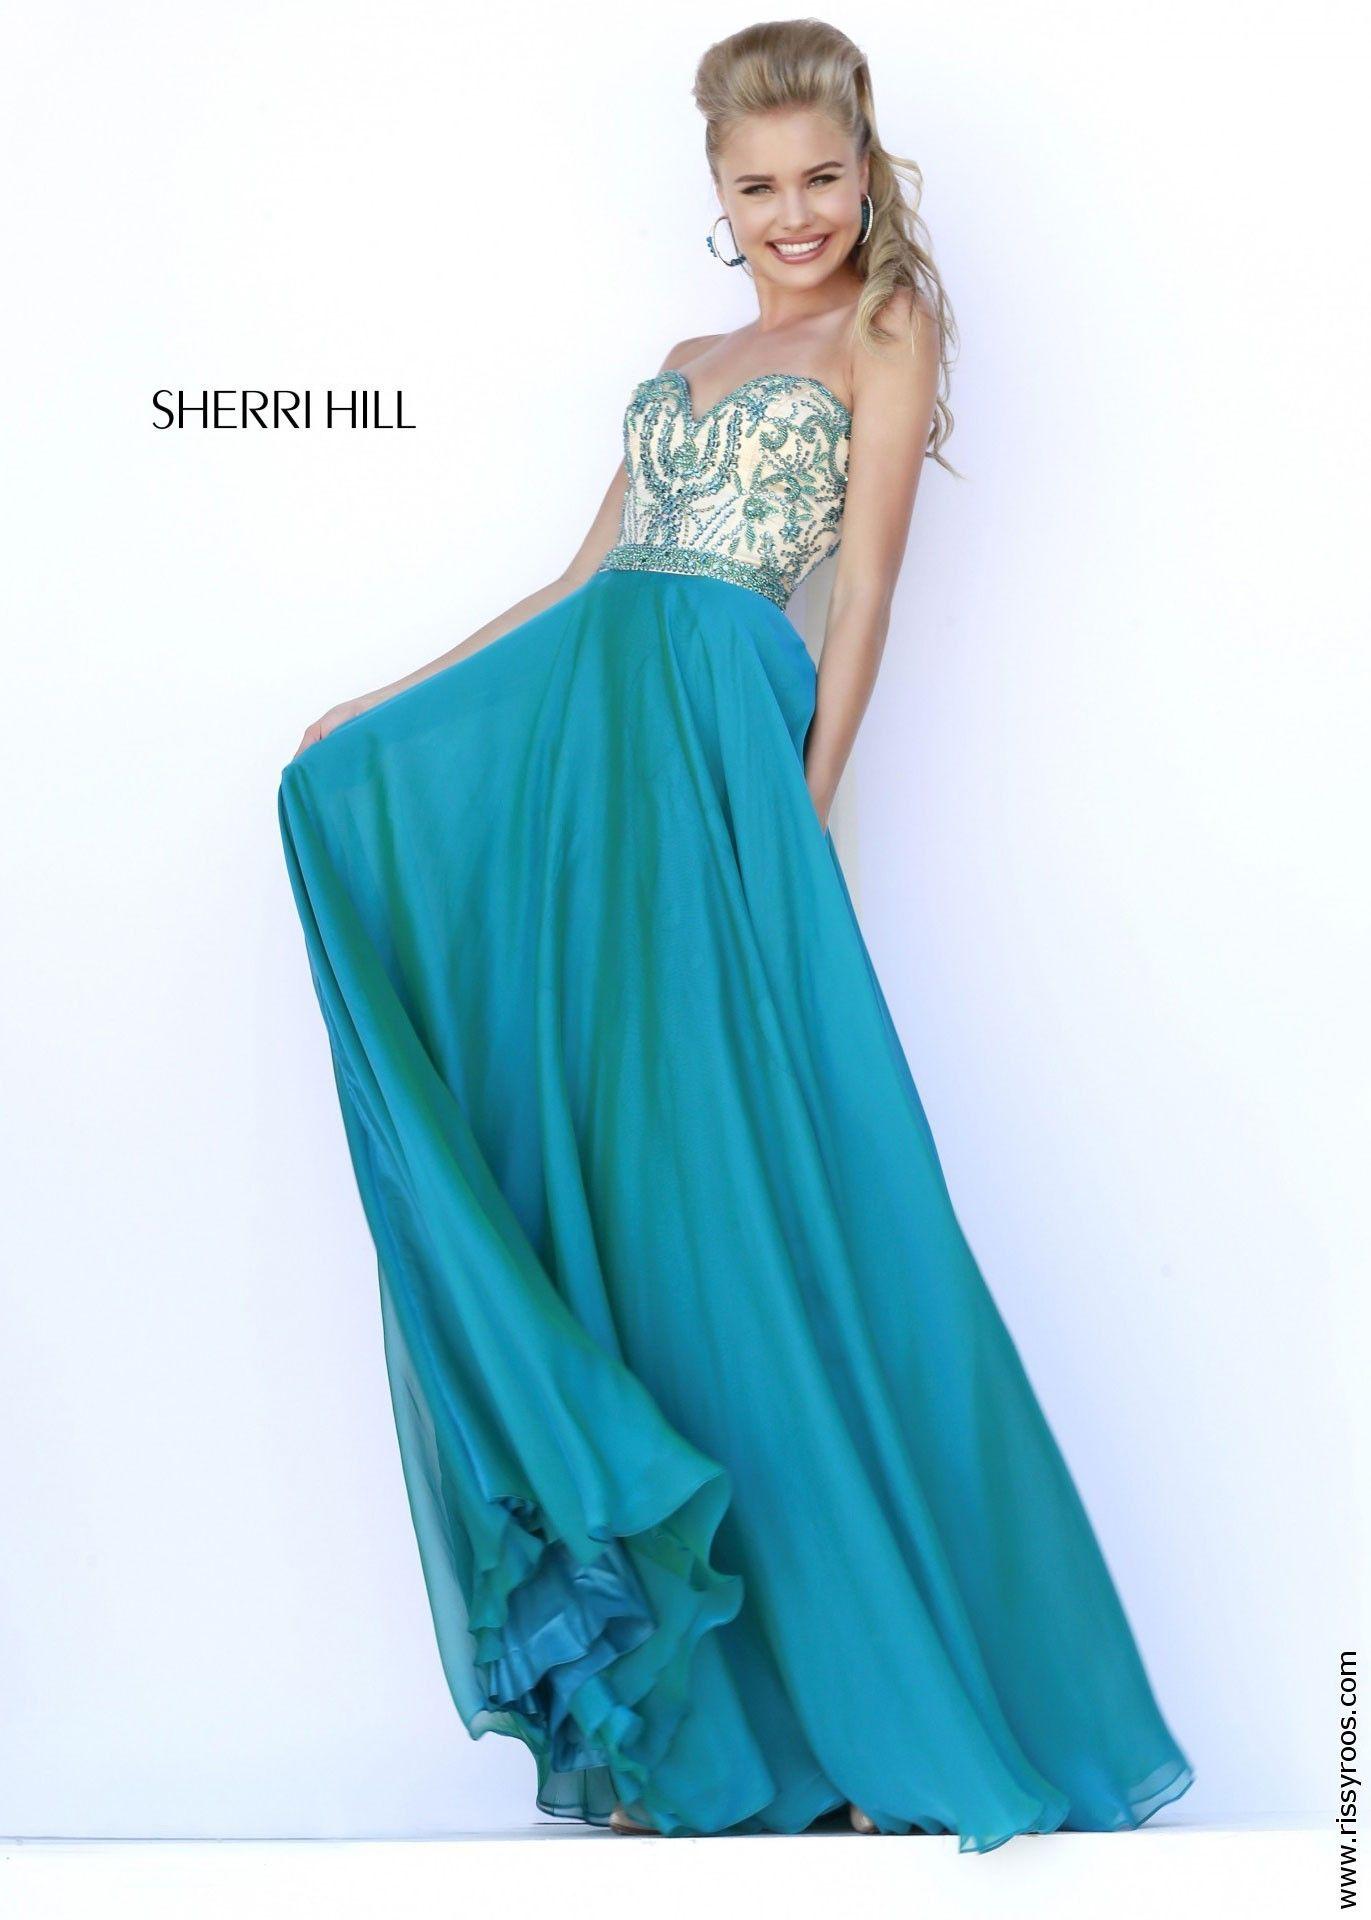 Sherri Hill 1947 Peacock Strapless Beaded Chiffon Long Prom Gown ...